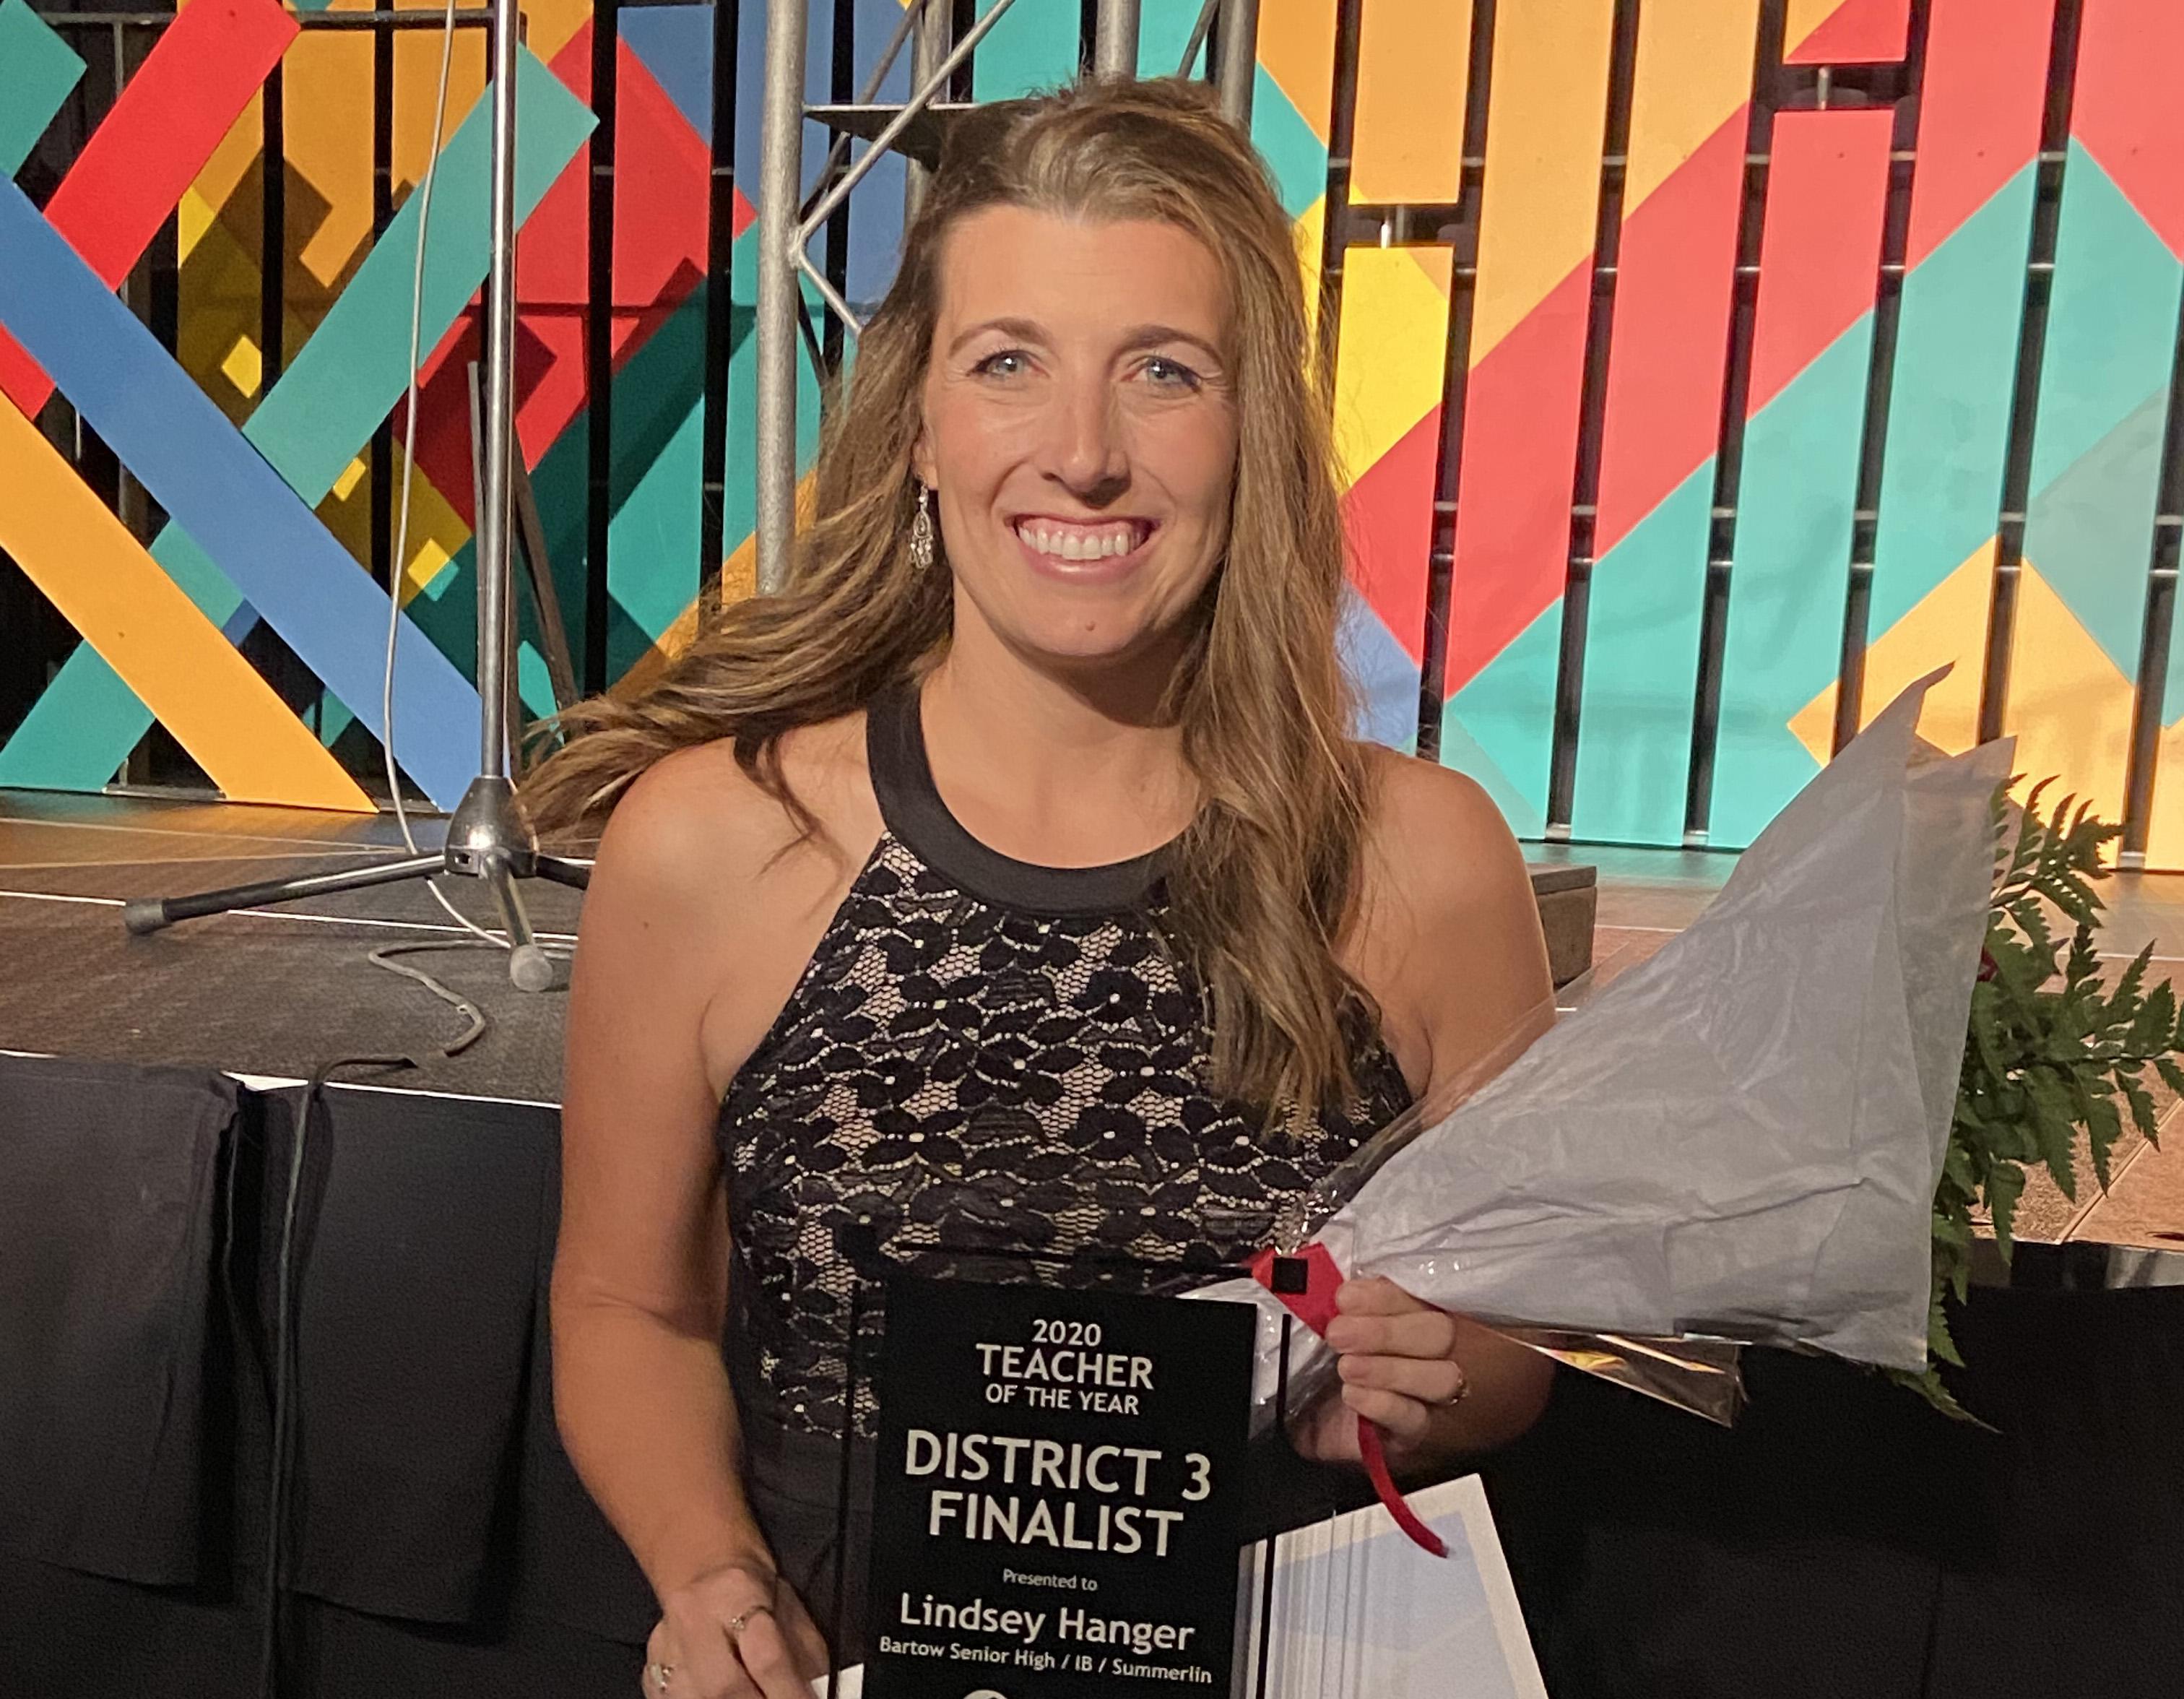 Hanger, Lindsey BHS 2020 Teacher of the Year